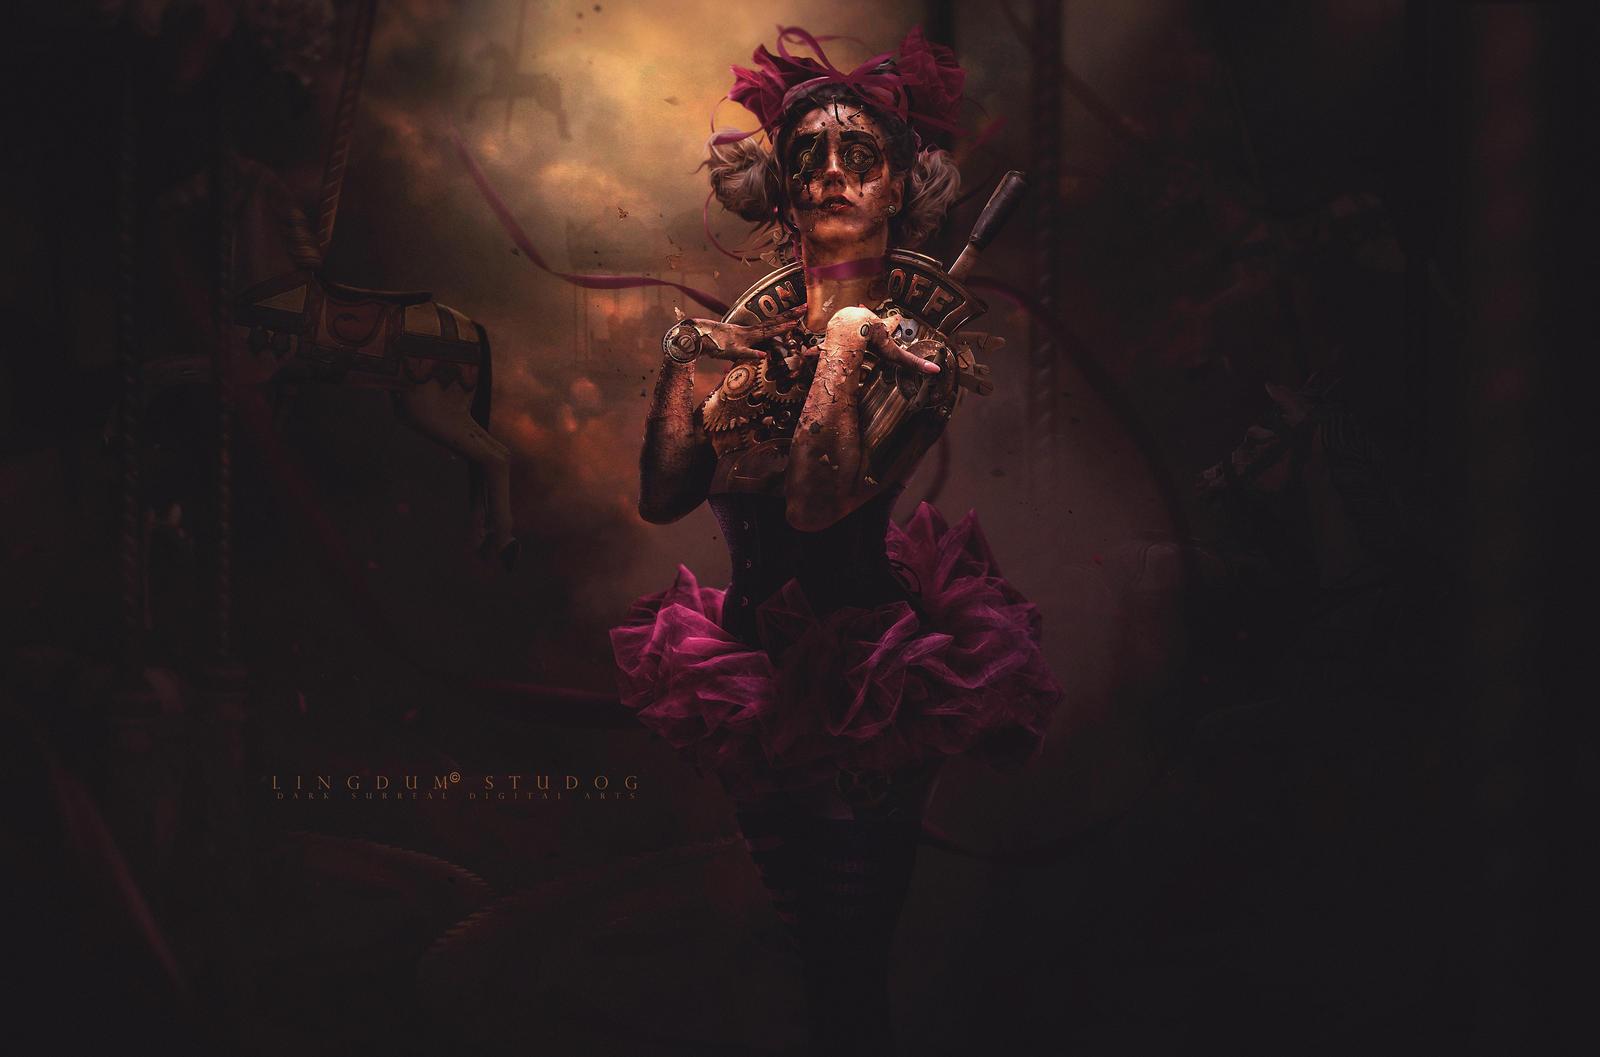 Oxidized Dolless # 5 Clown by LINGDUMSTUDOG